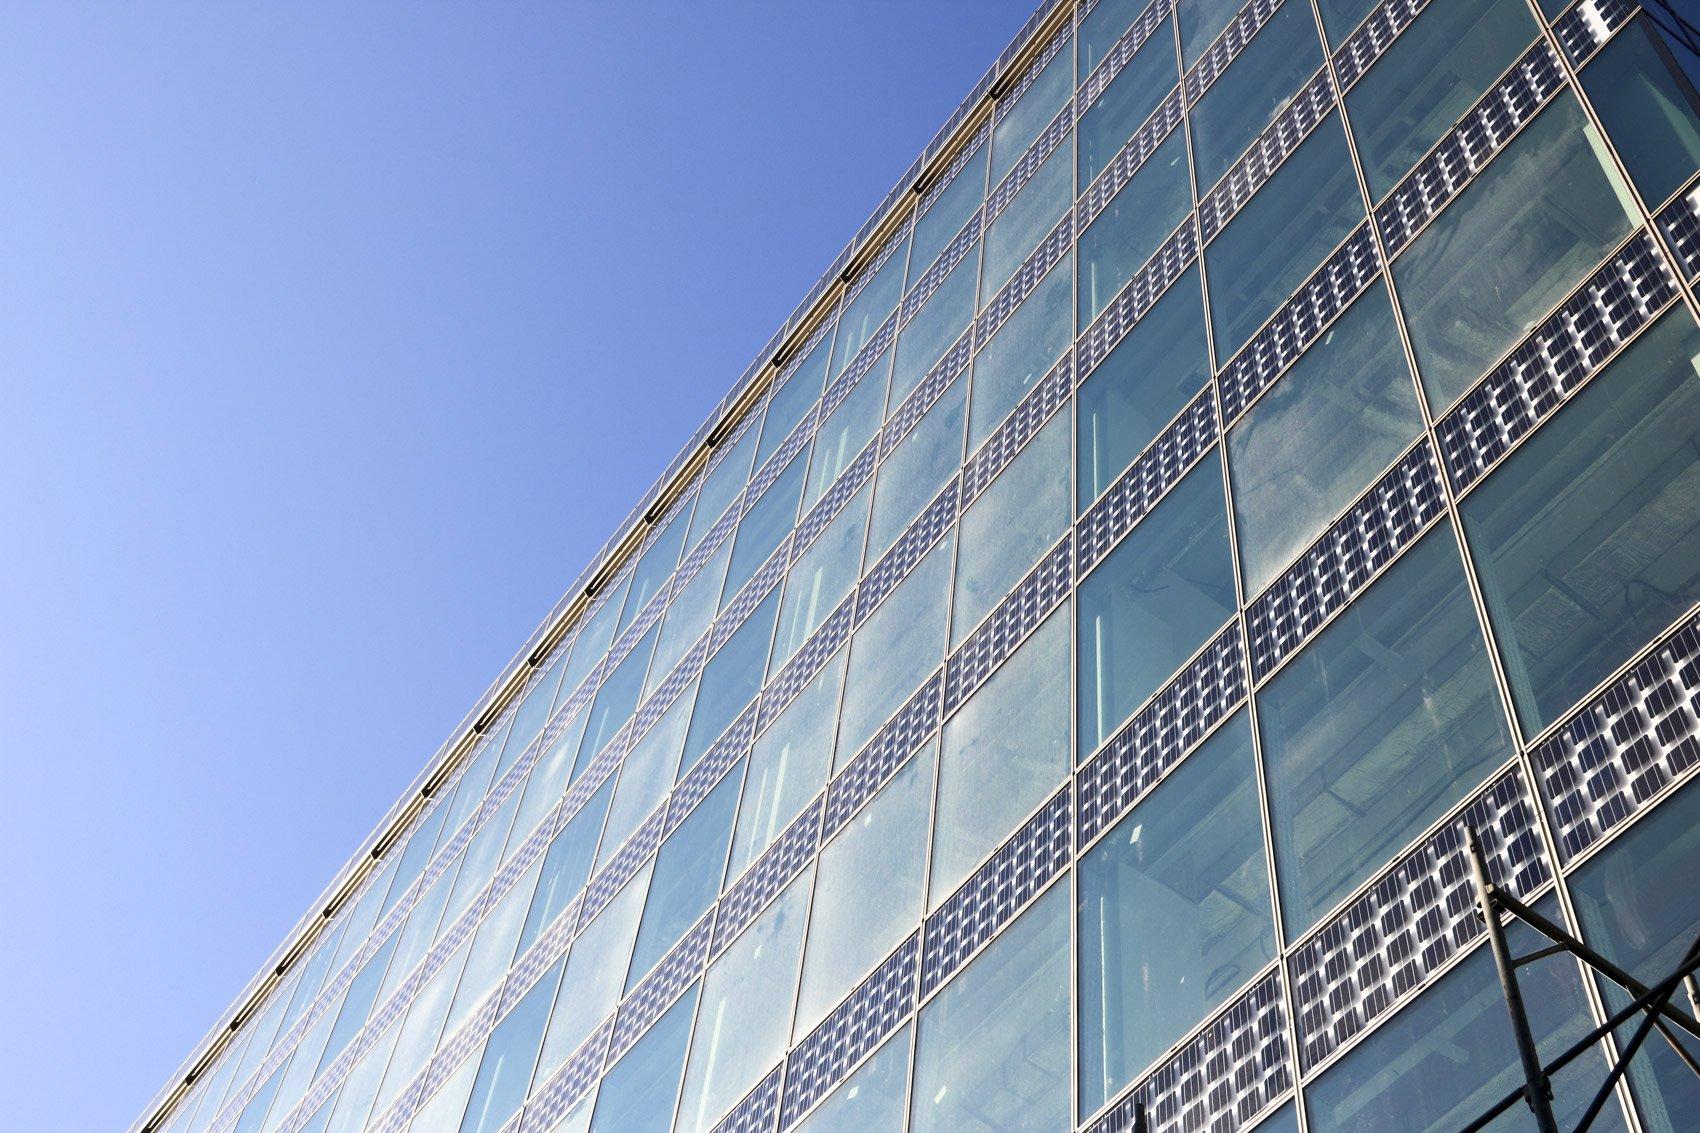 2Degrees Building Courtesy Saint-Gobain Glass